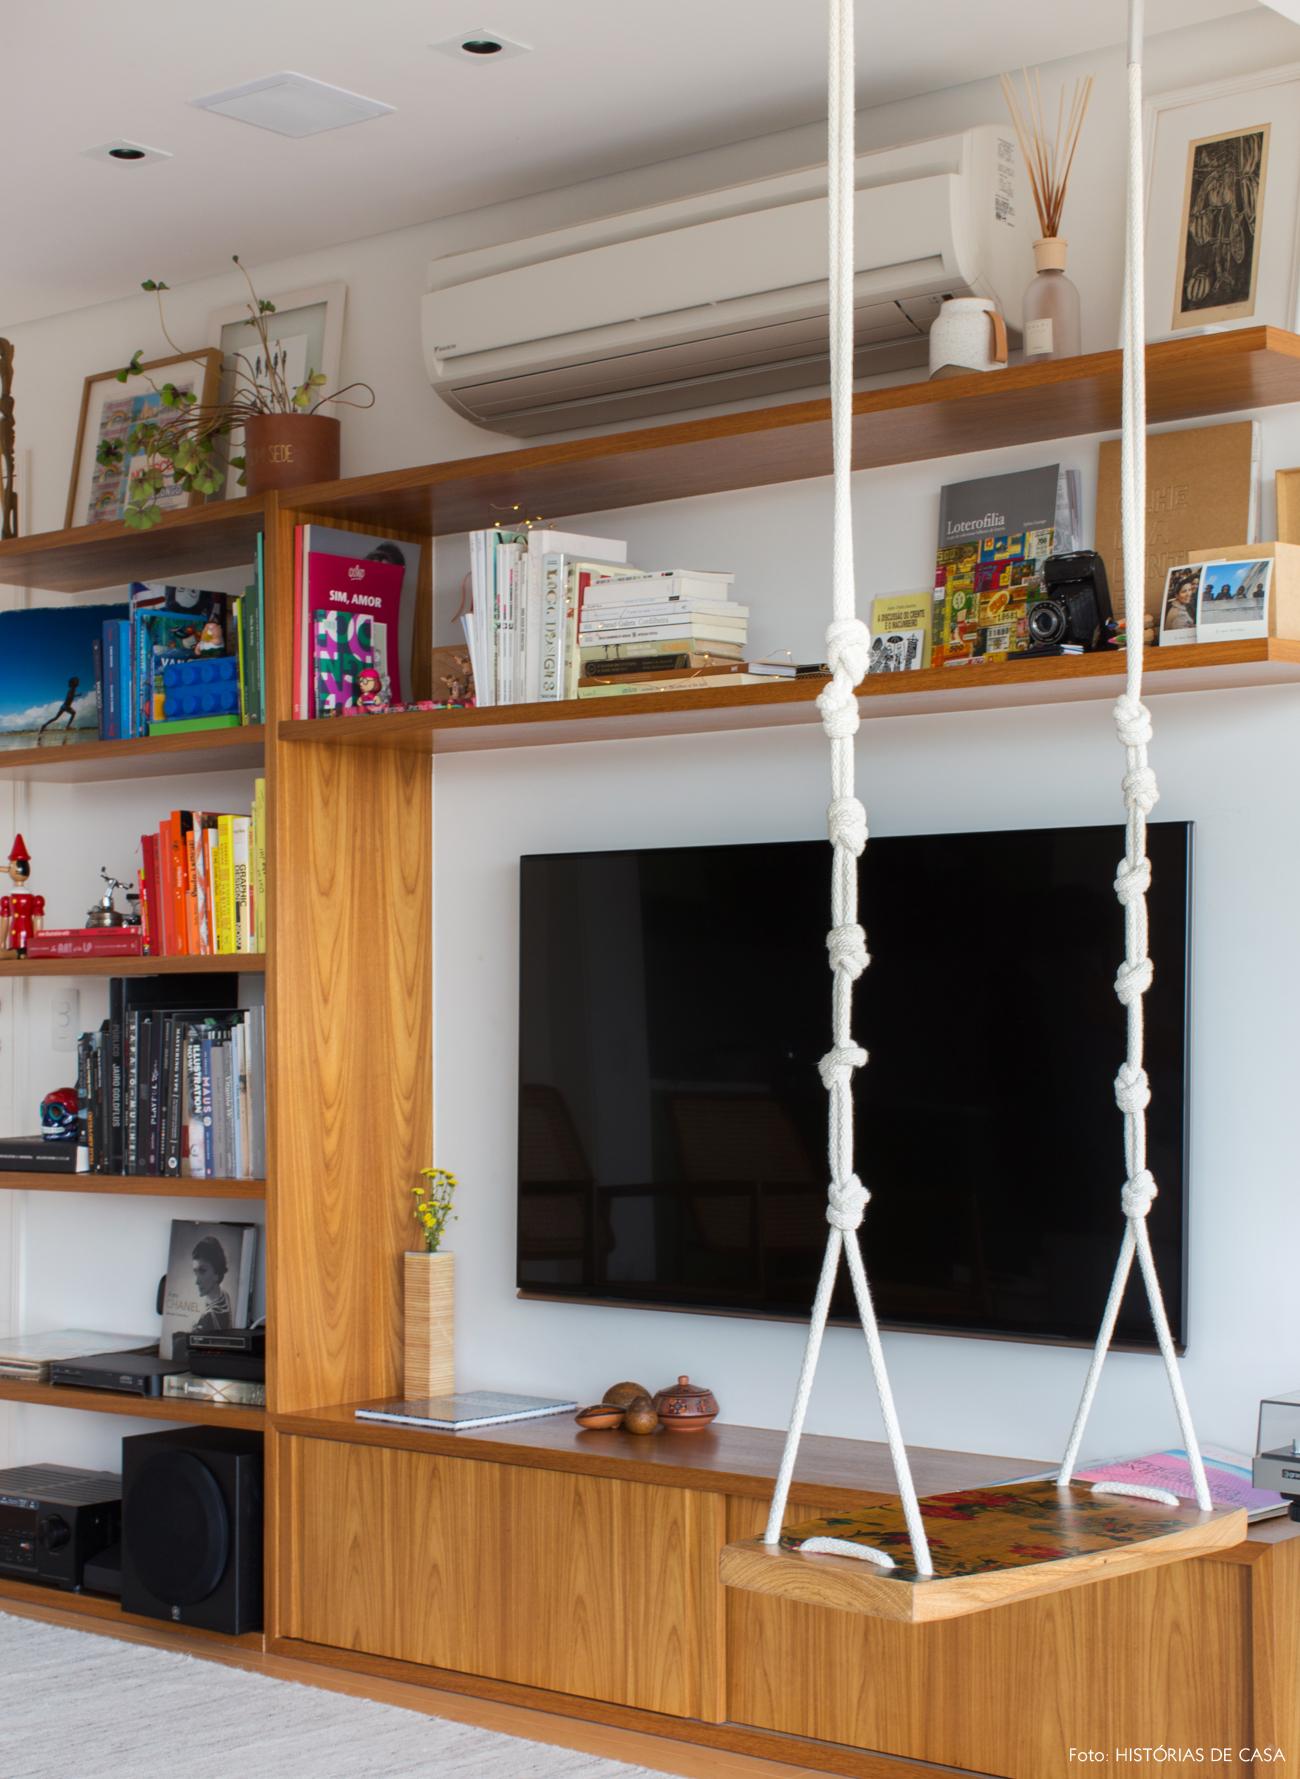 04-decoracao-apartamento-integrado-marcenaria-sala-estar-balanco